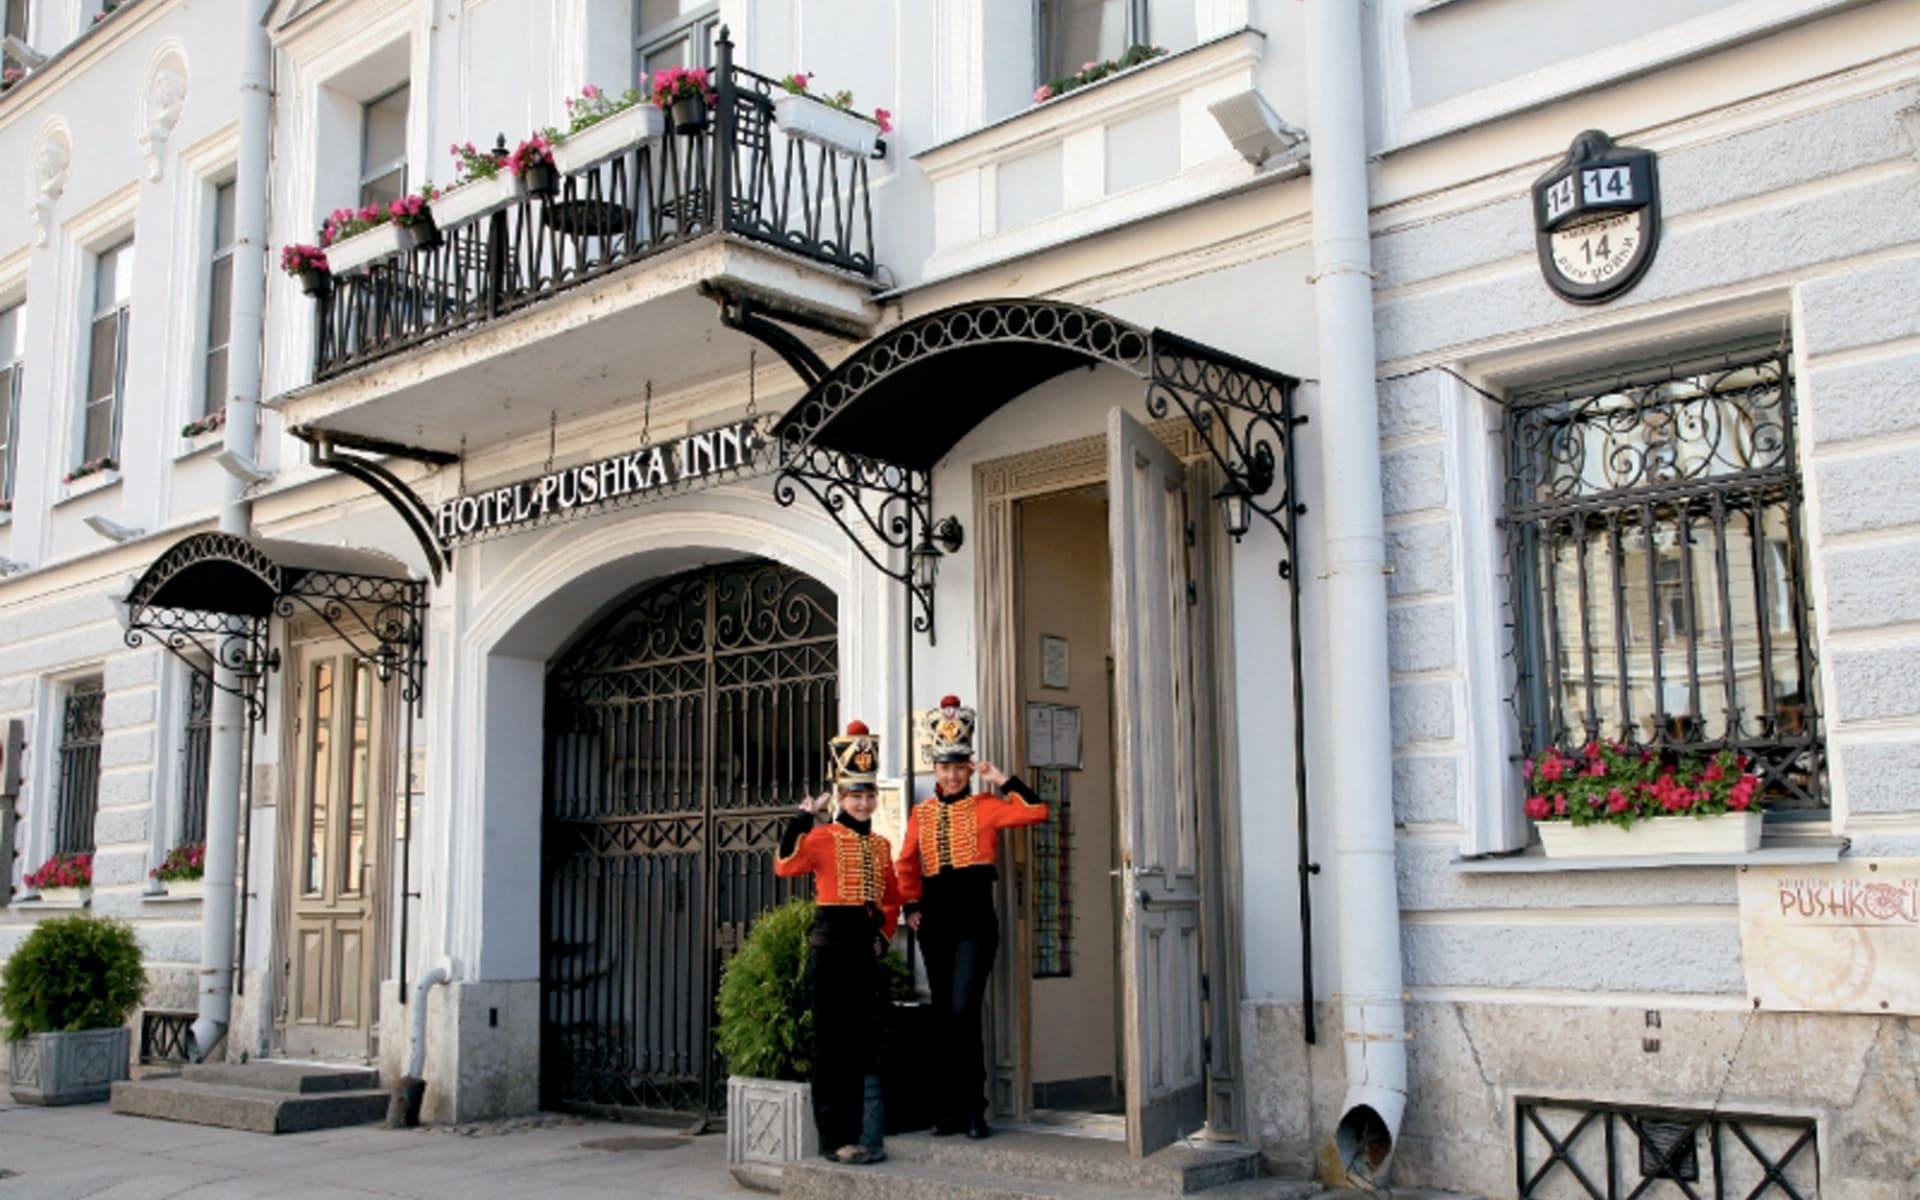 Hotel Pushka Inn in St. Petersburg: Russland_St.Petersburg_PushkaInn_Fassade